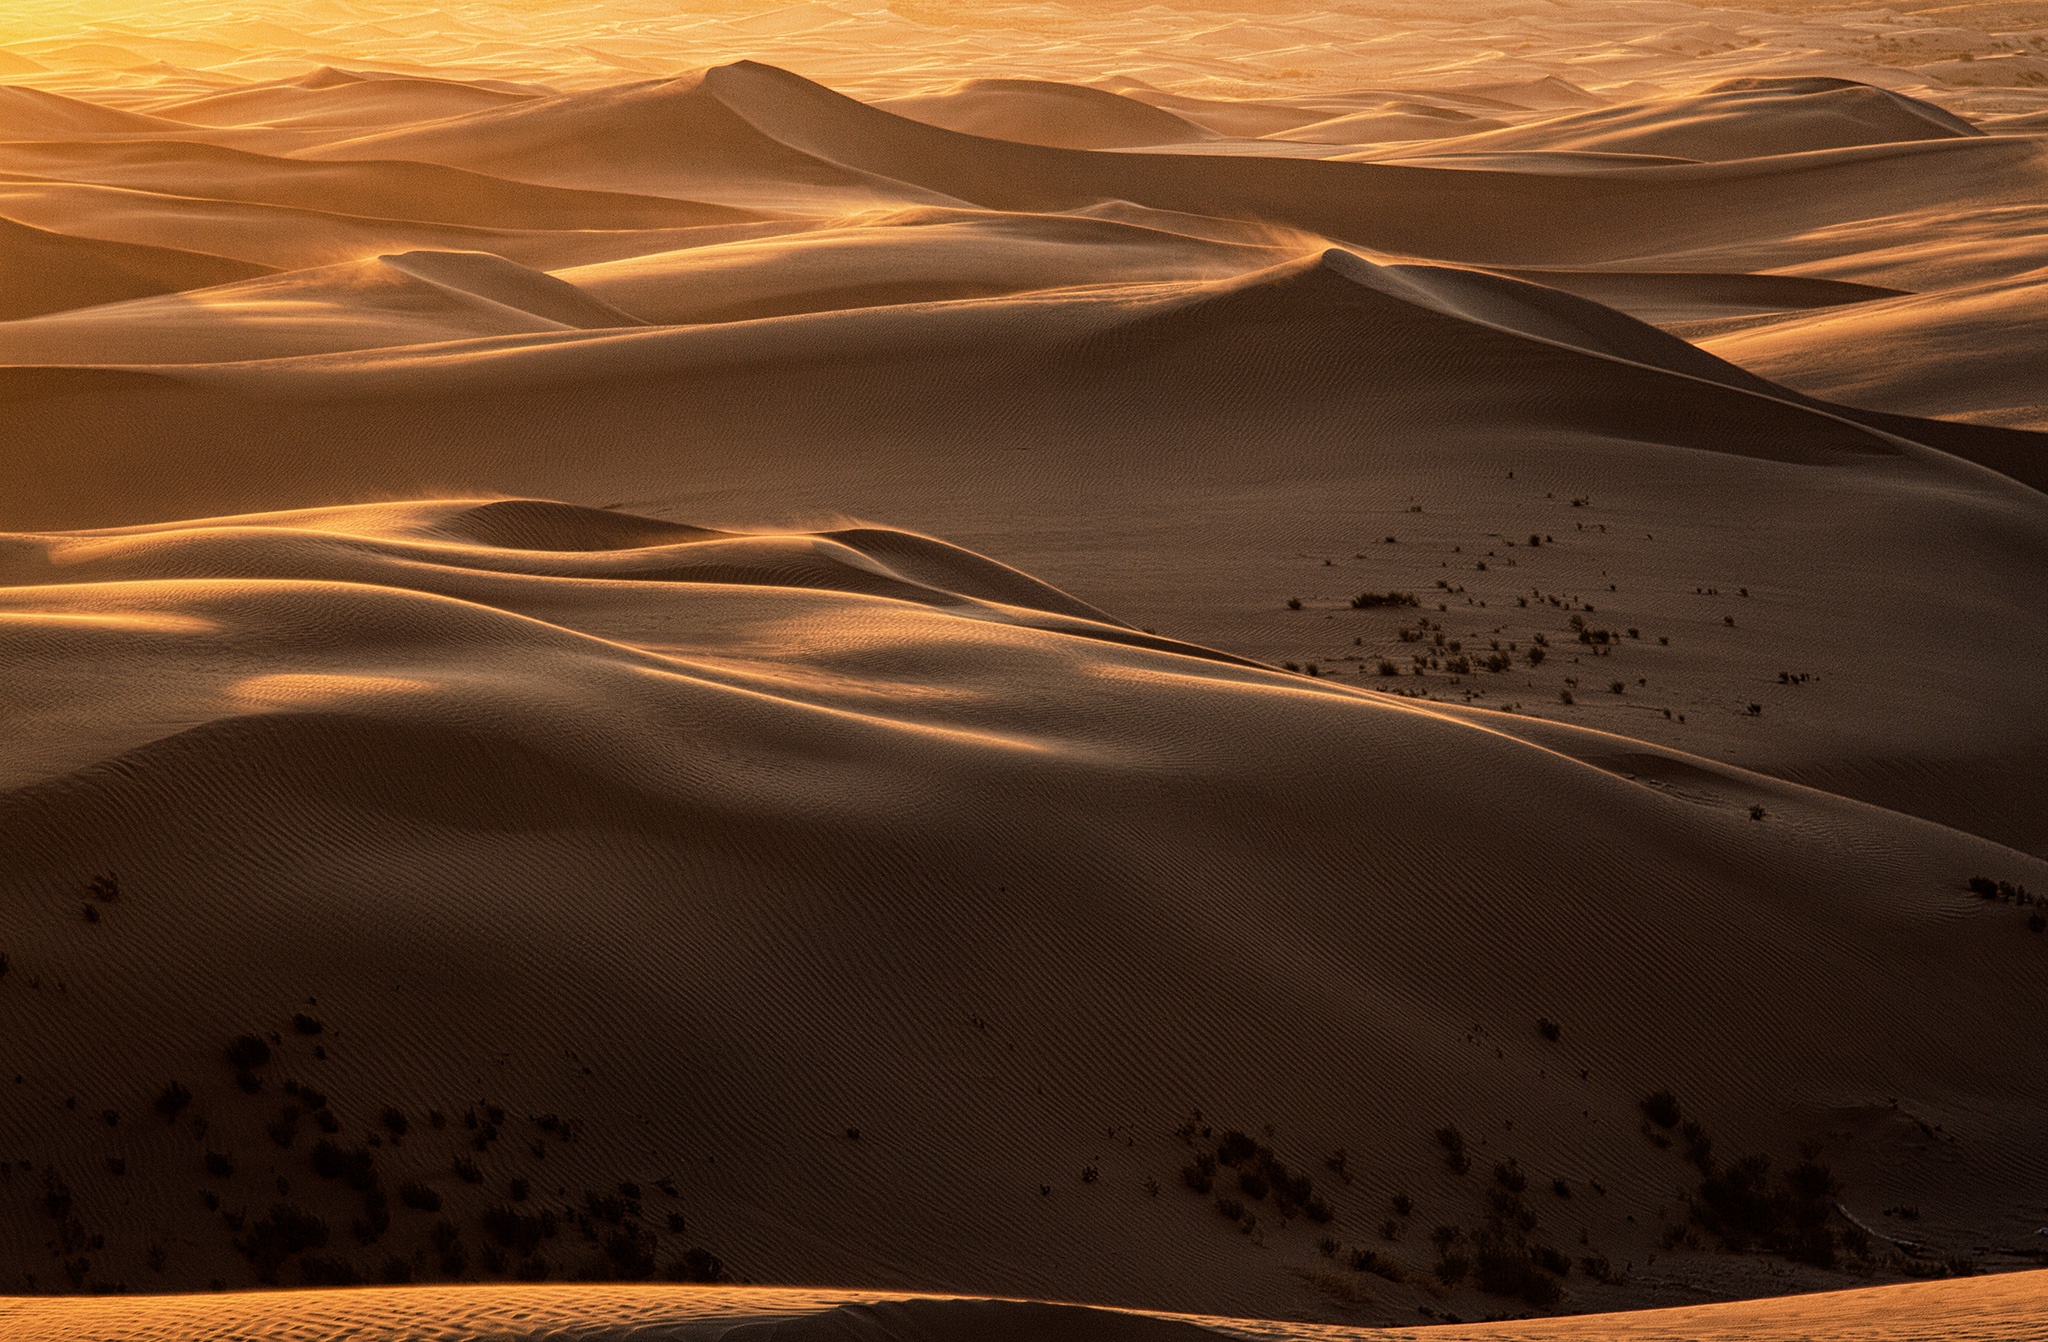 Little Sahara Sand Dunes, Utah, 2018